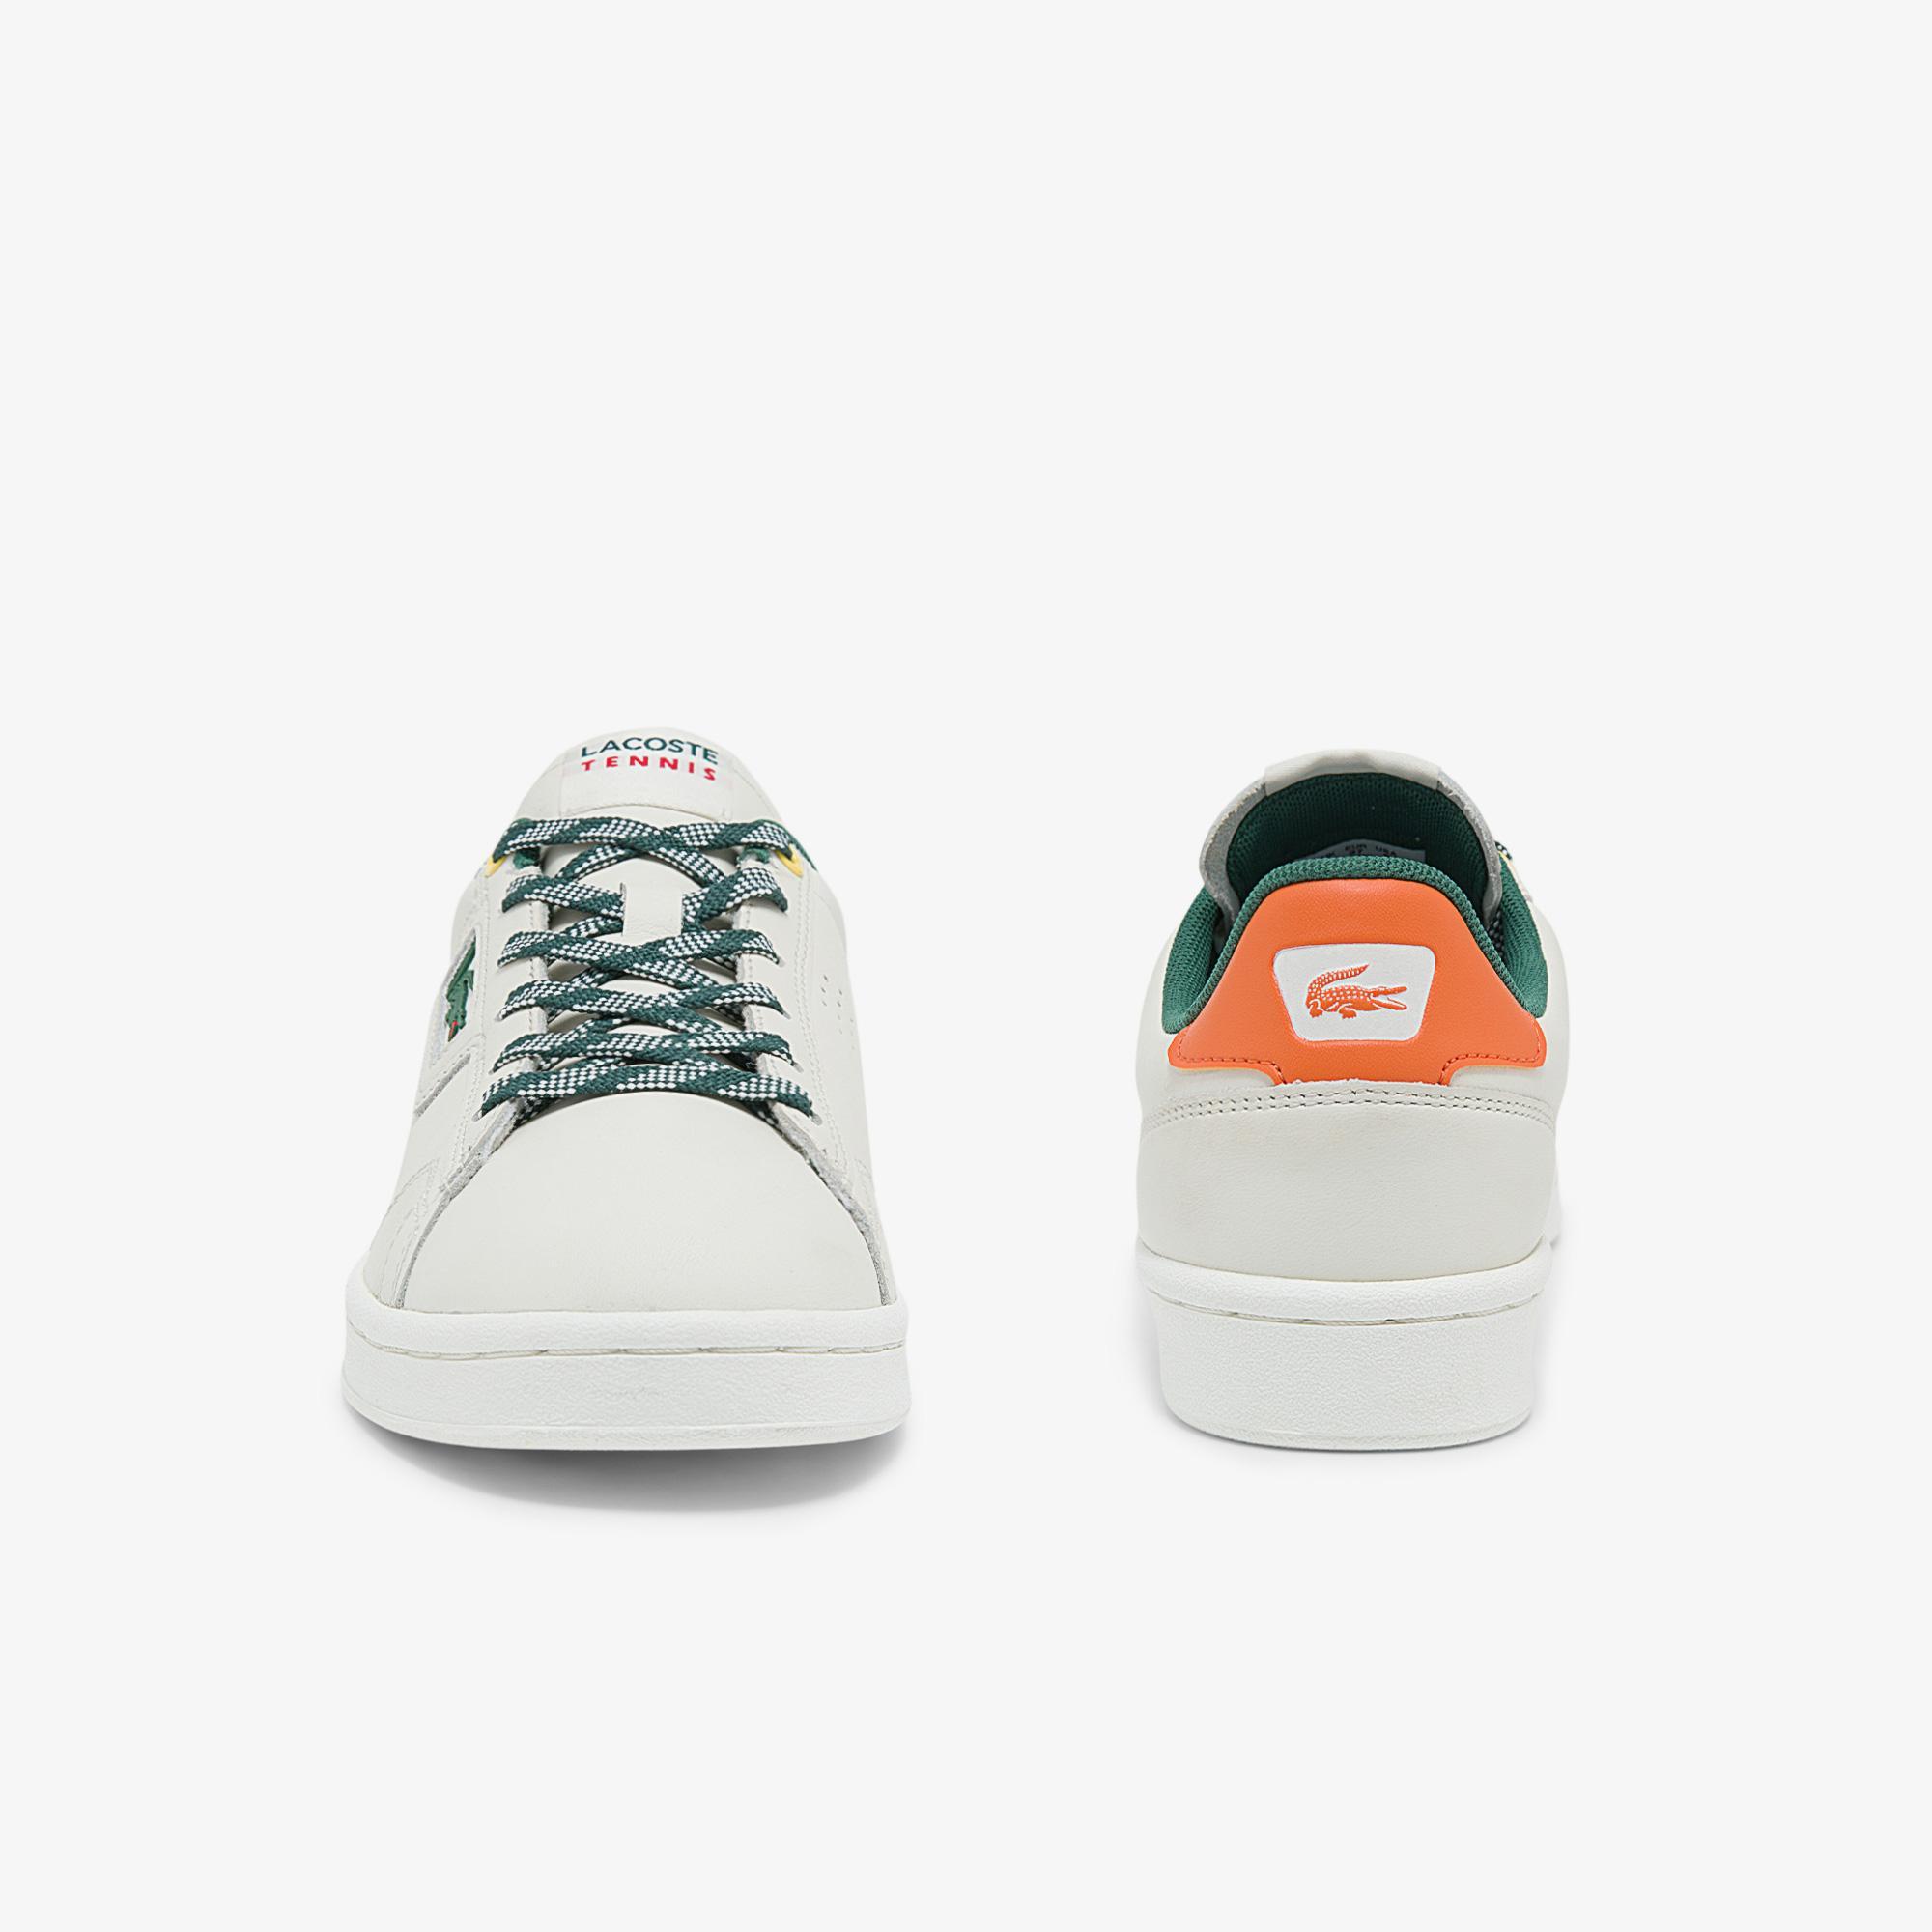 Lacoste Masters Classic 01213 Sfa Kadın Beyaz - Yeşil Sneaker